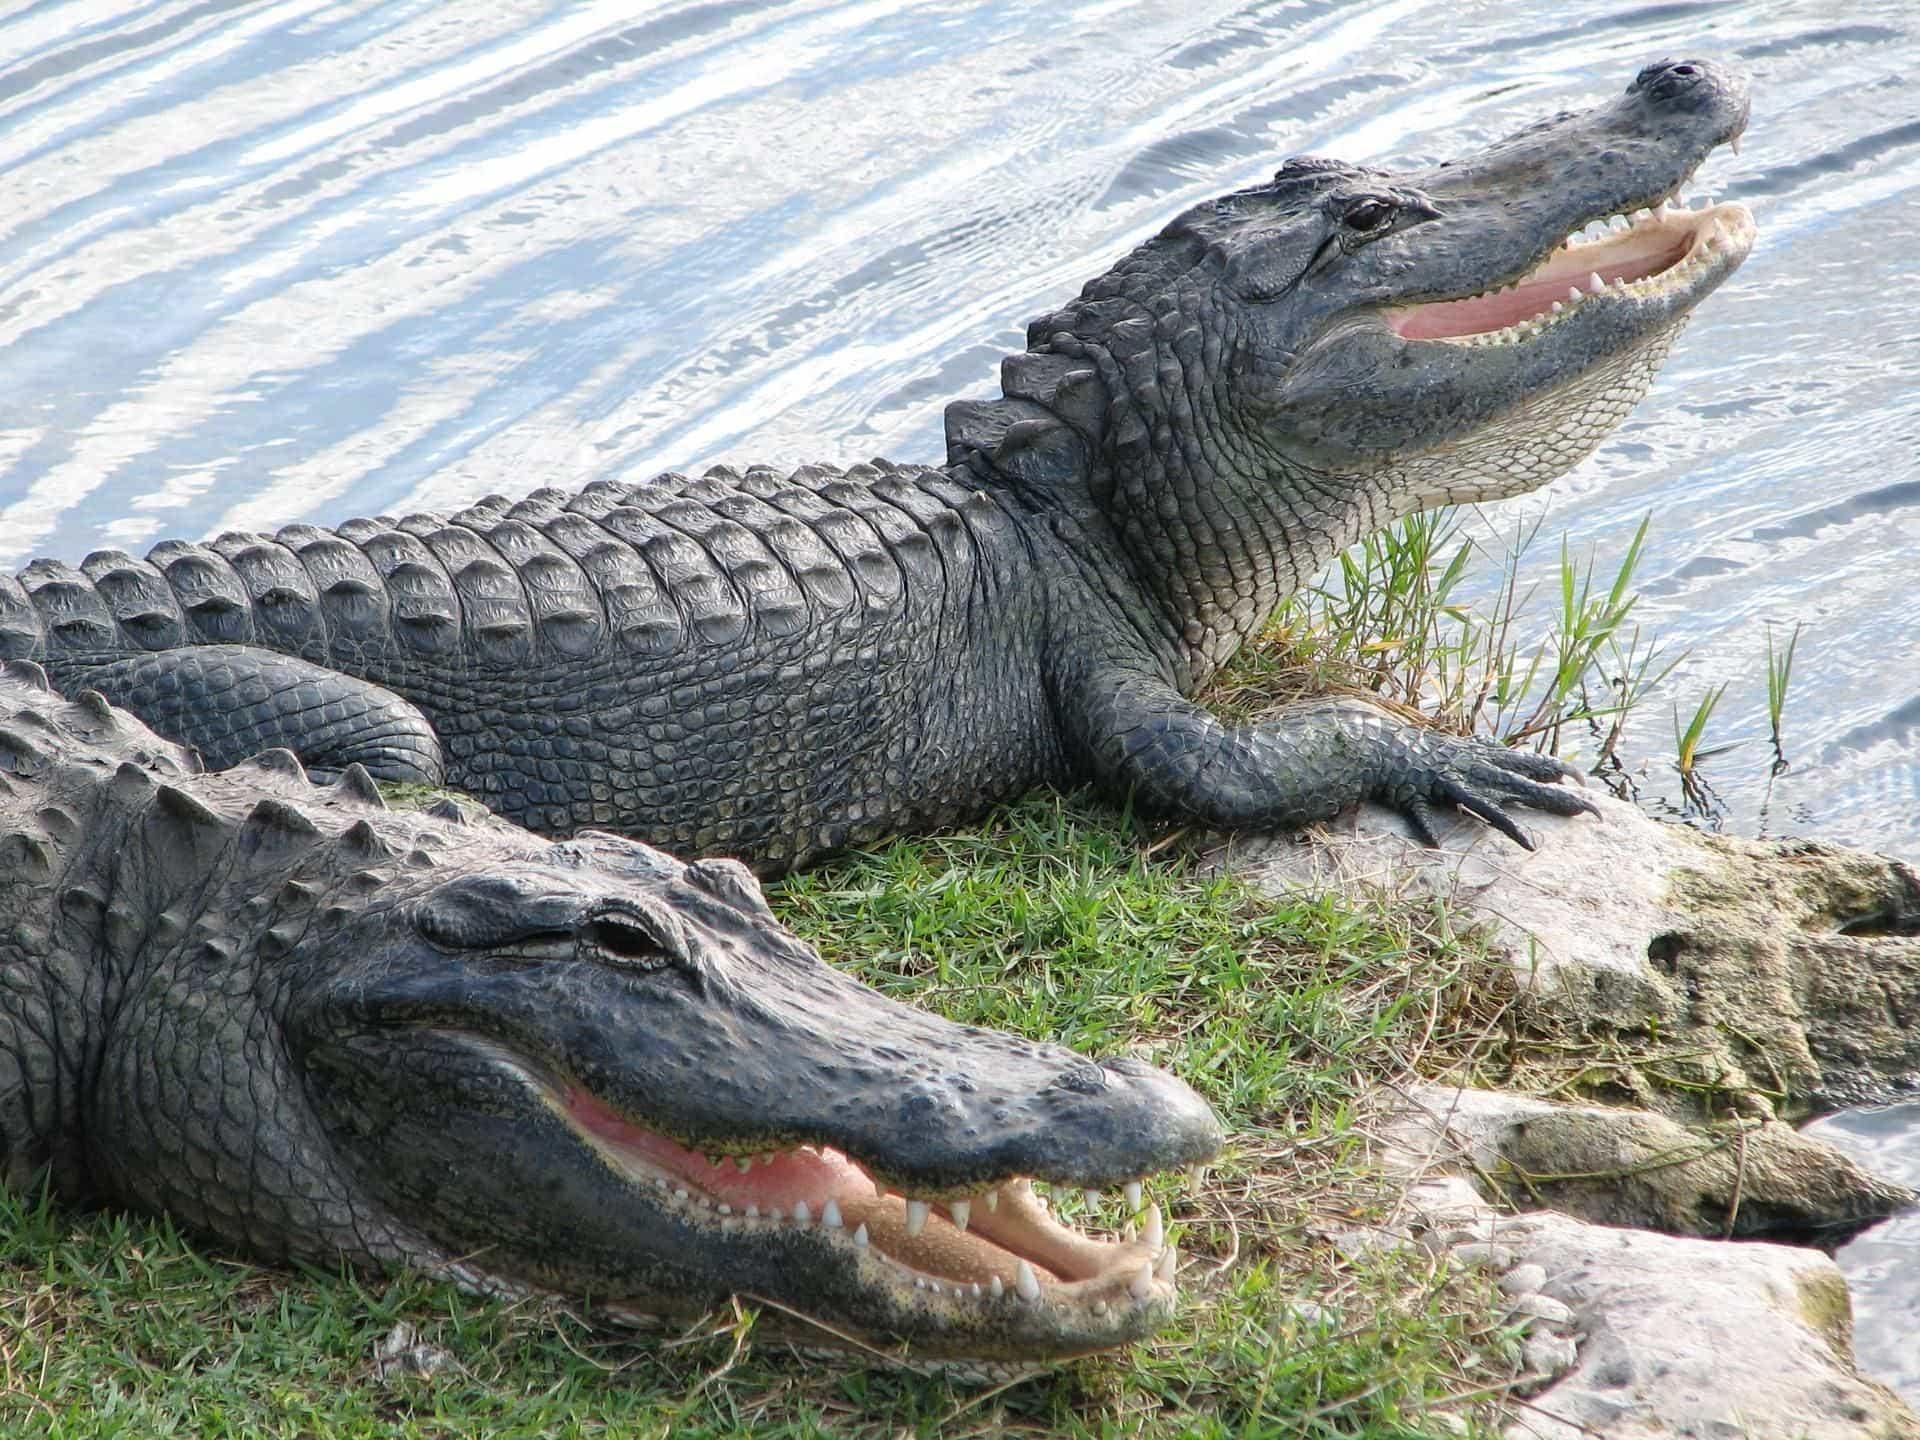 Alligator Dream Meaning